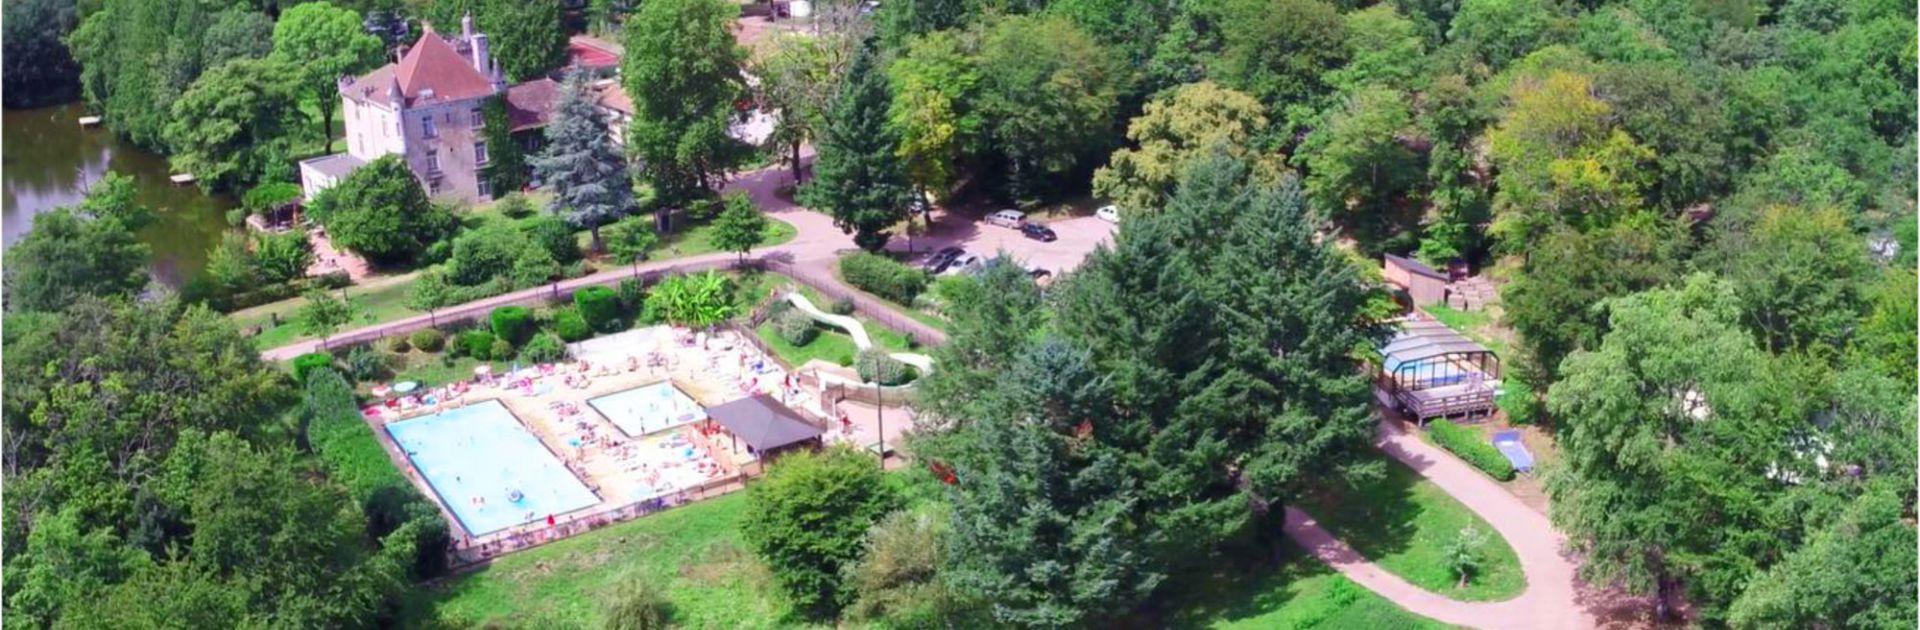 Parc Naturel Périgord Limousin